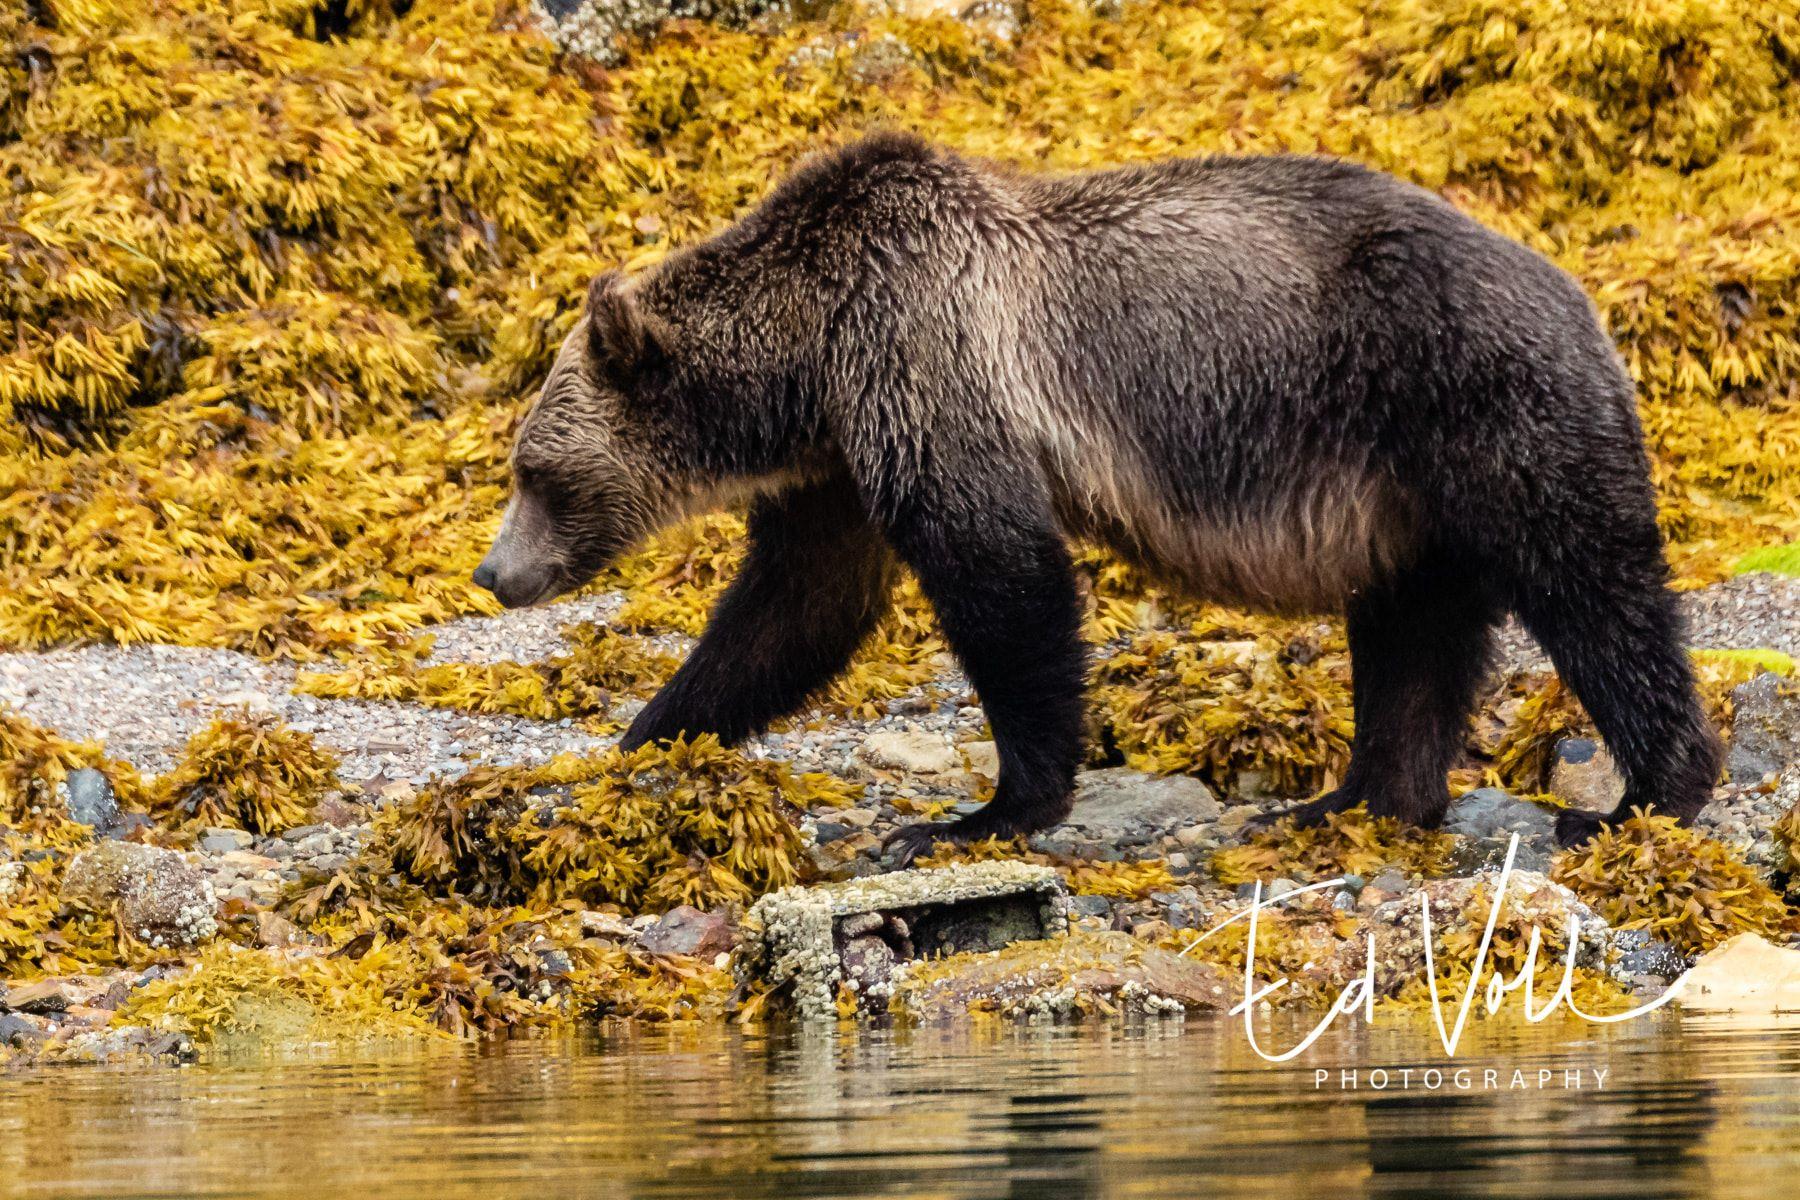 Foto: Ed Voll, British Columbia